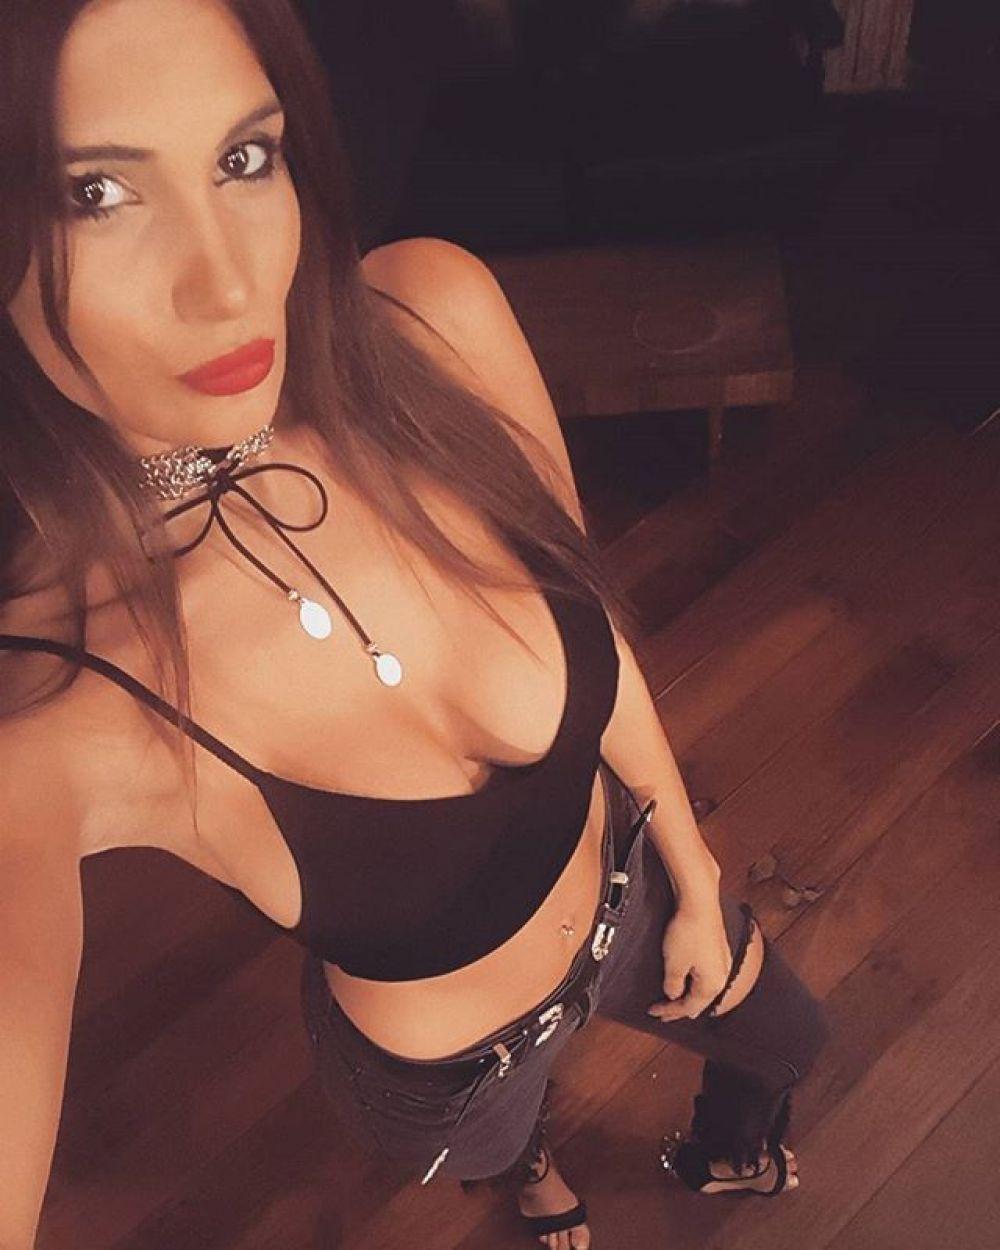 Instagram Magali Mora nude (27 photo), Ass, Fappening, Selfie, swimsuit 2018